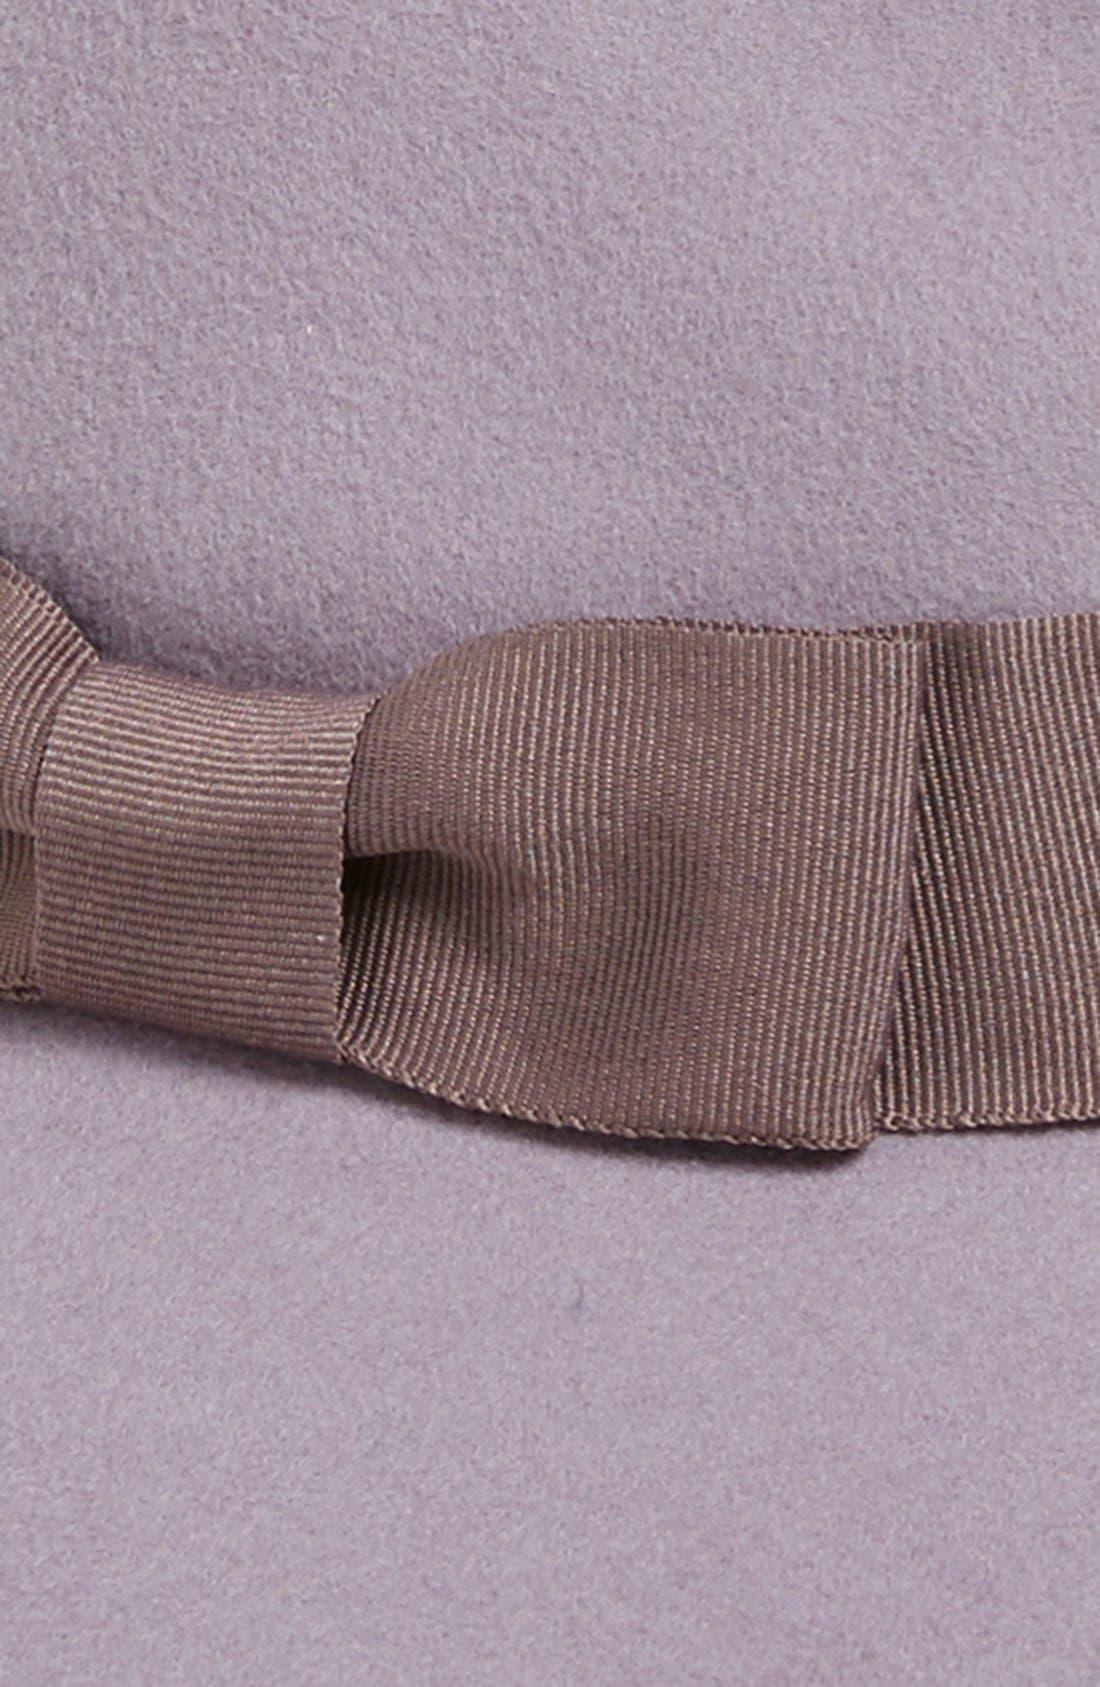 Alternate Image 2  - August Hat Pastel Wool Fedora